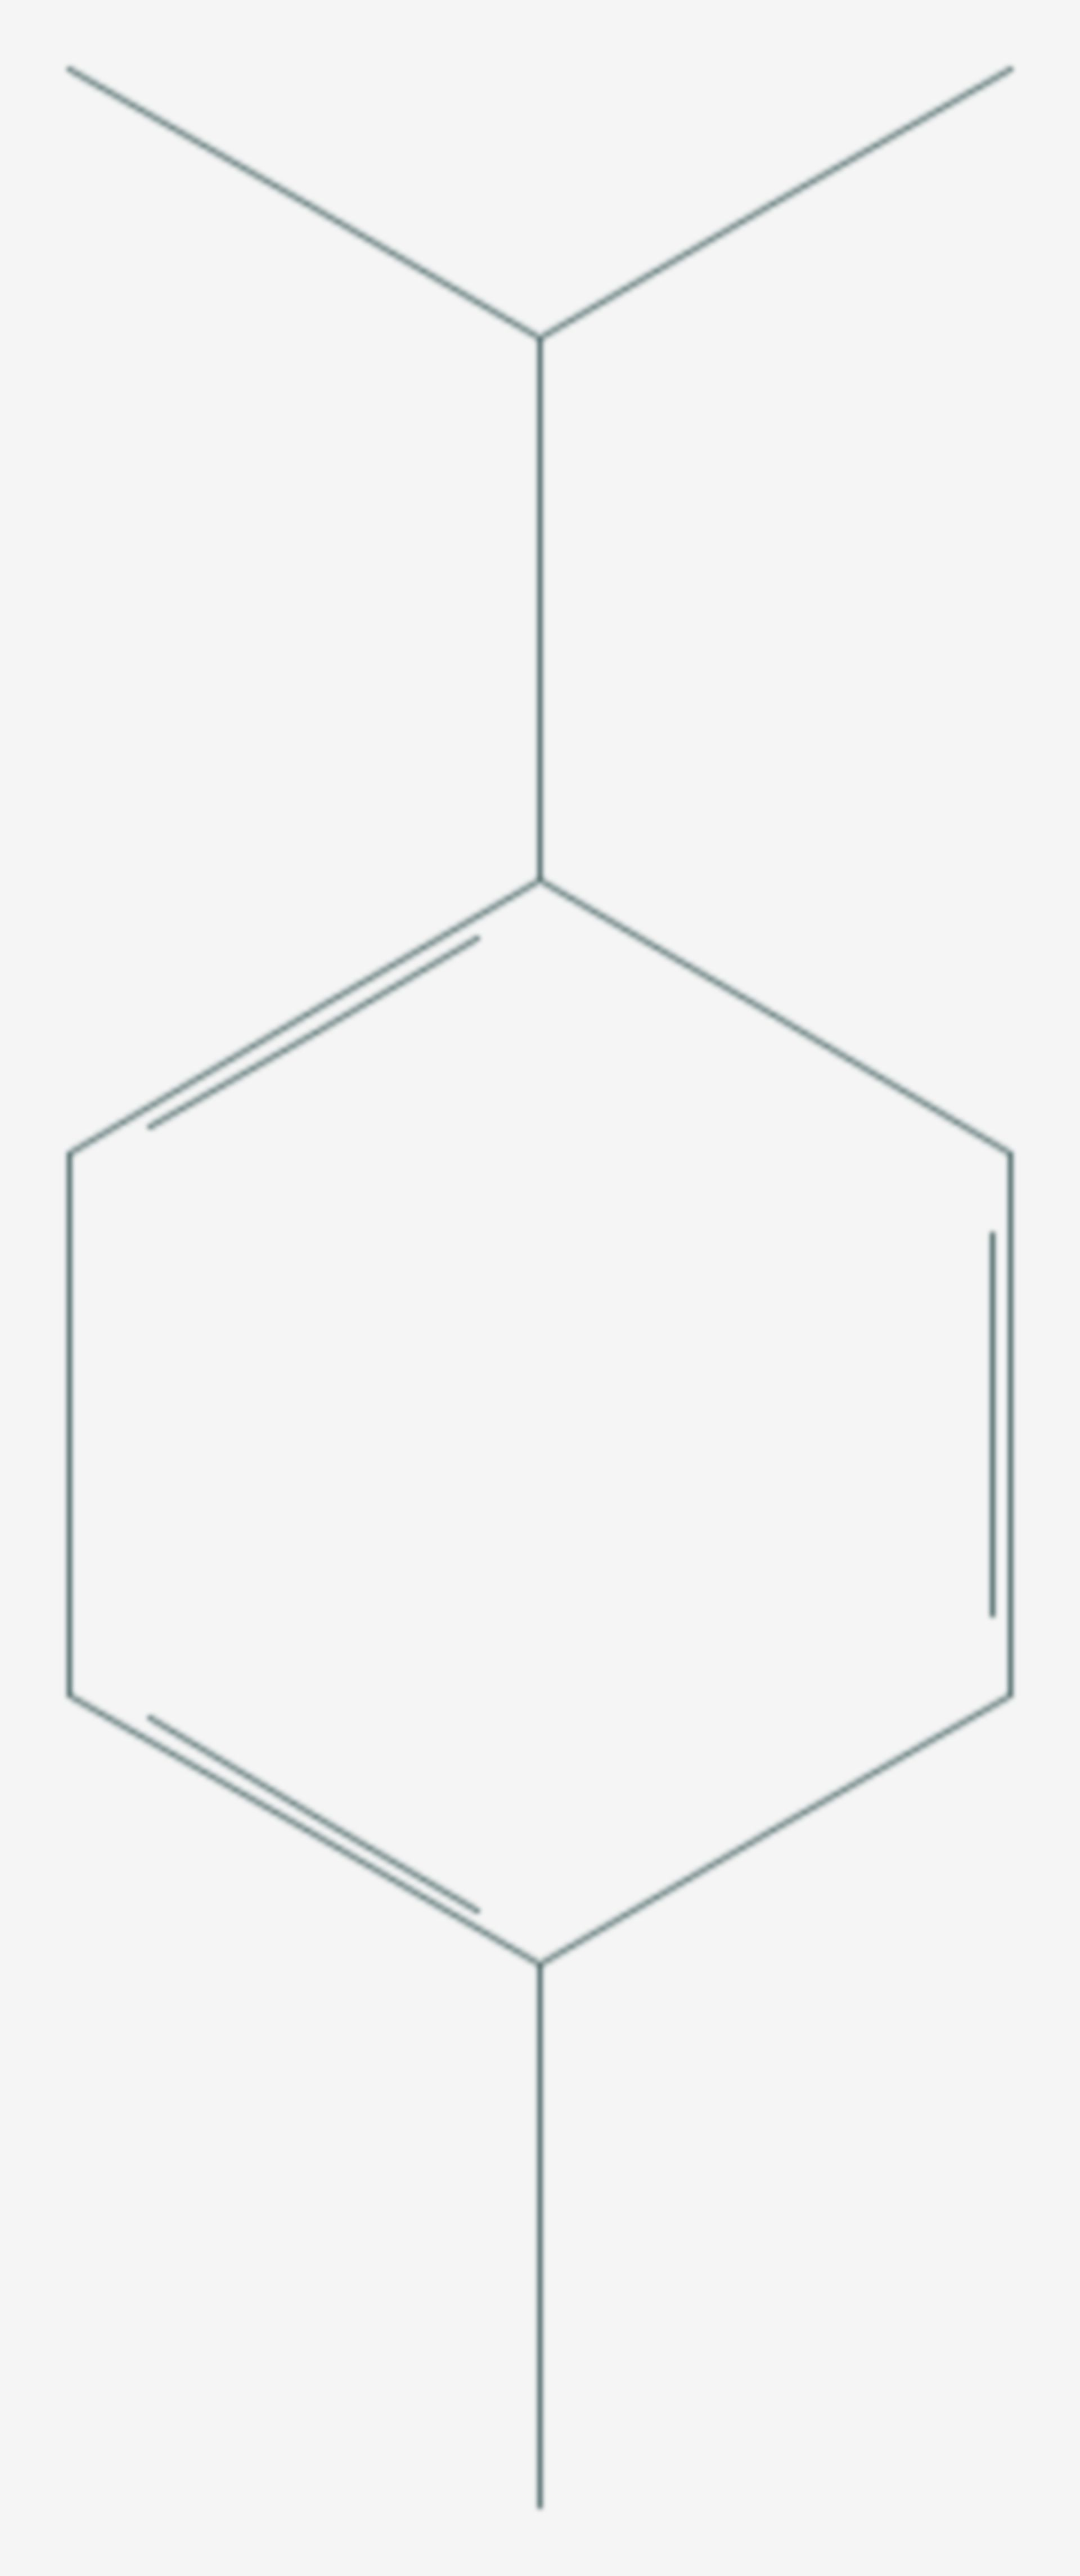 P-Cymol (Strukturformel)